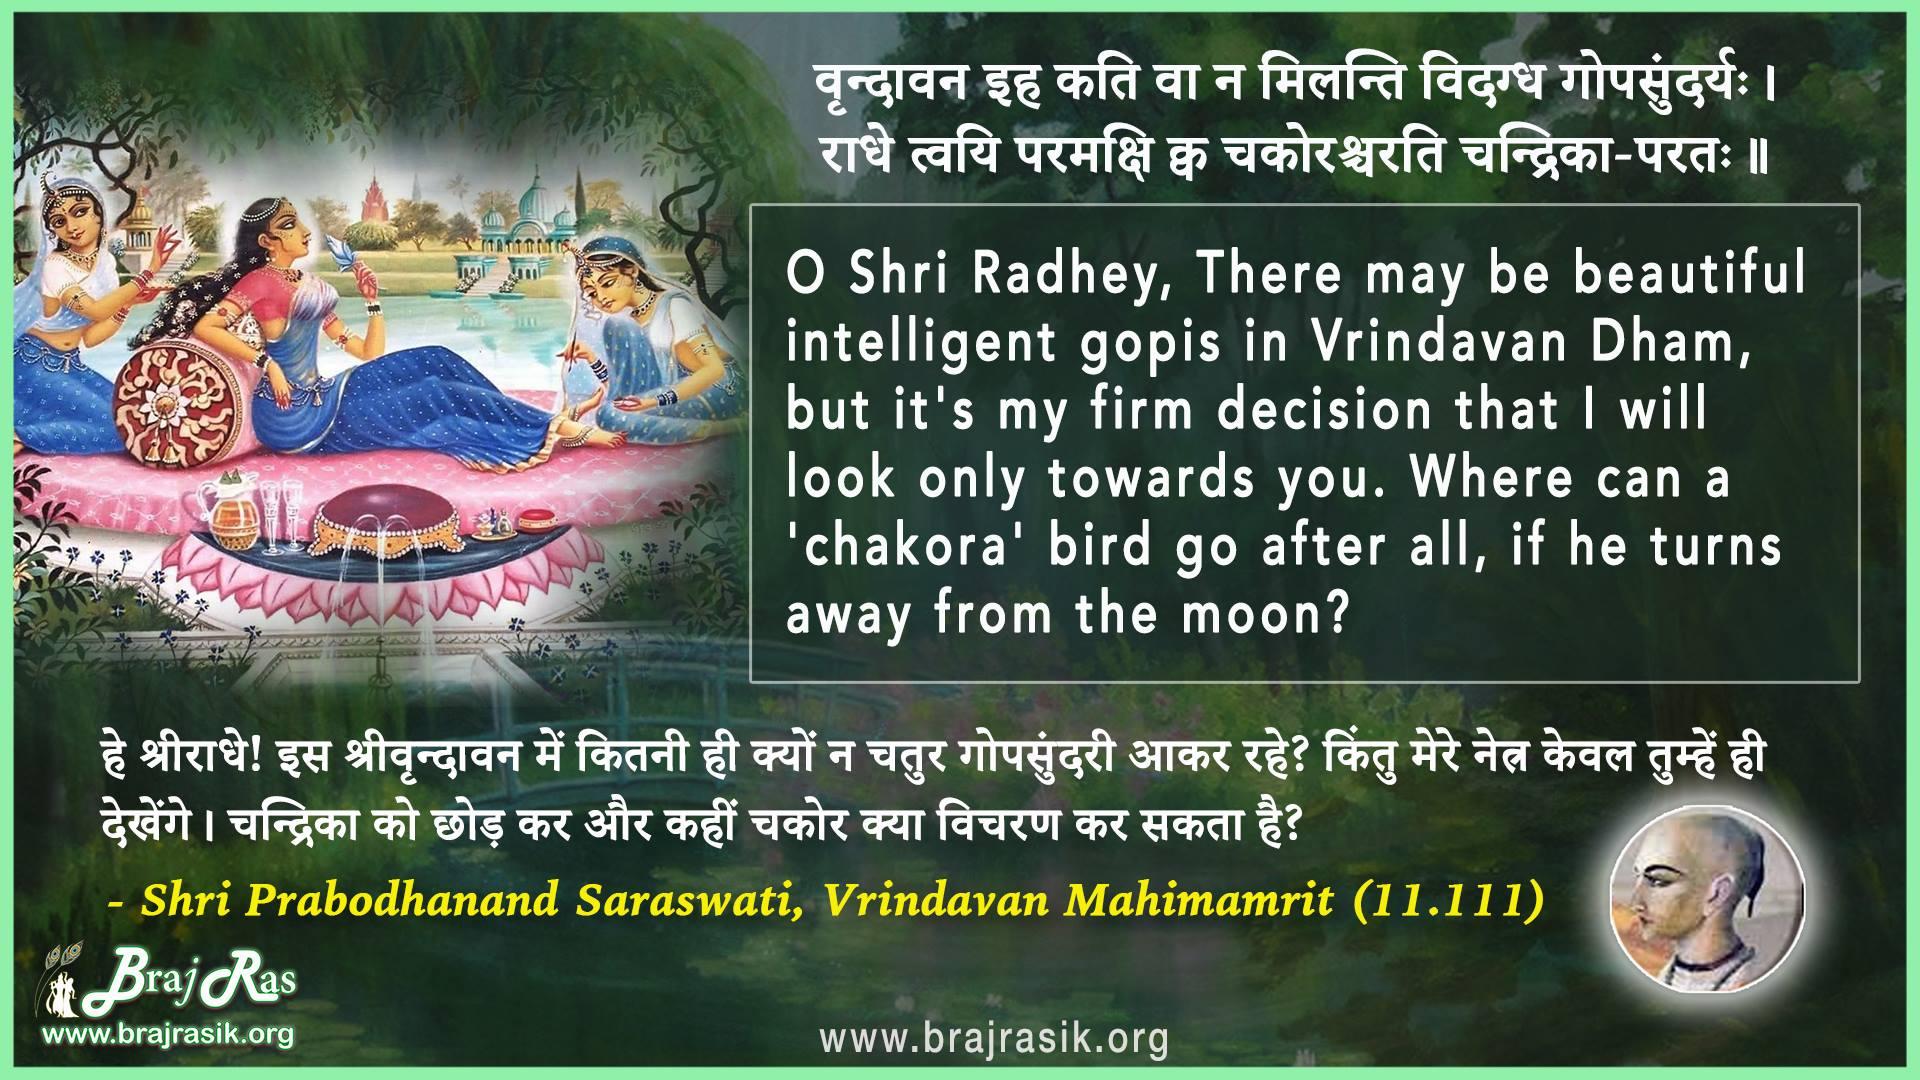 Vrindavan Iha Kati Va Na - Shri Prabodhanand Saraswati, Vrindavan Mahimamrit (11.111)